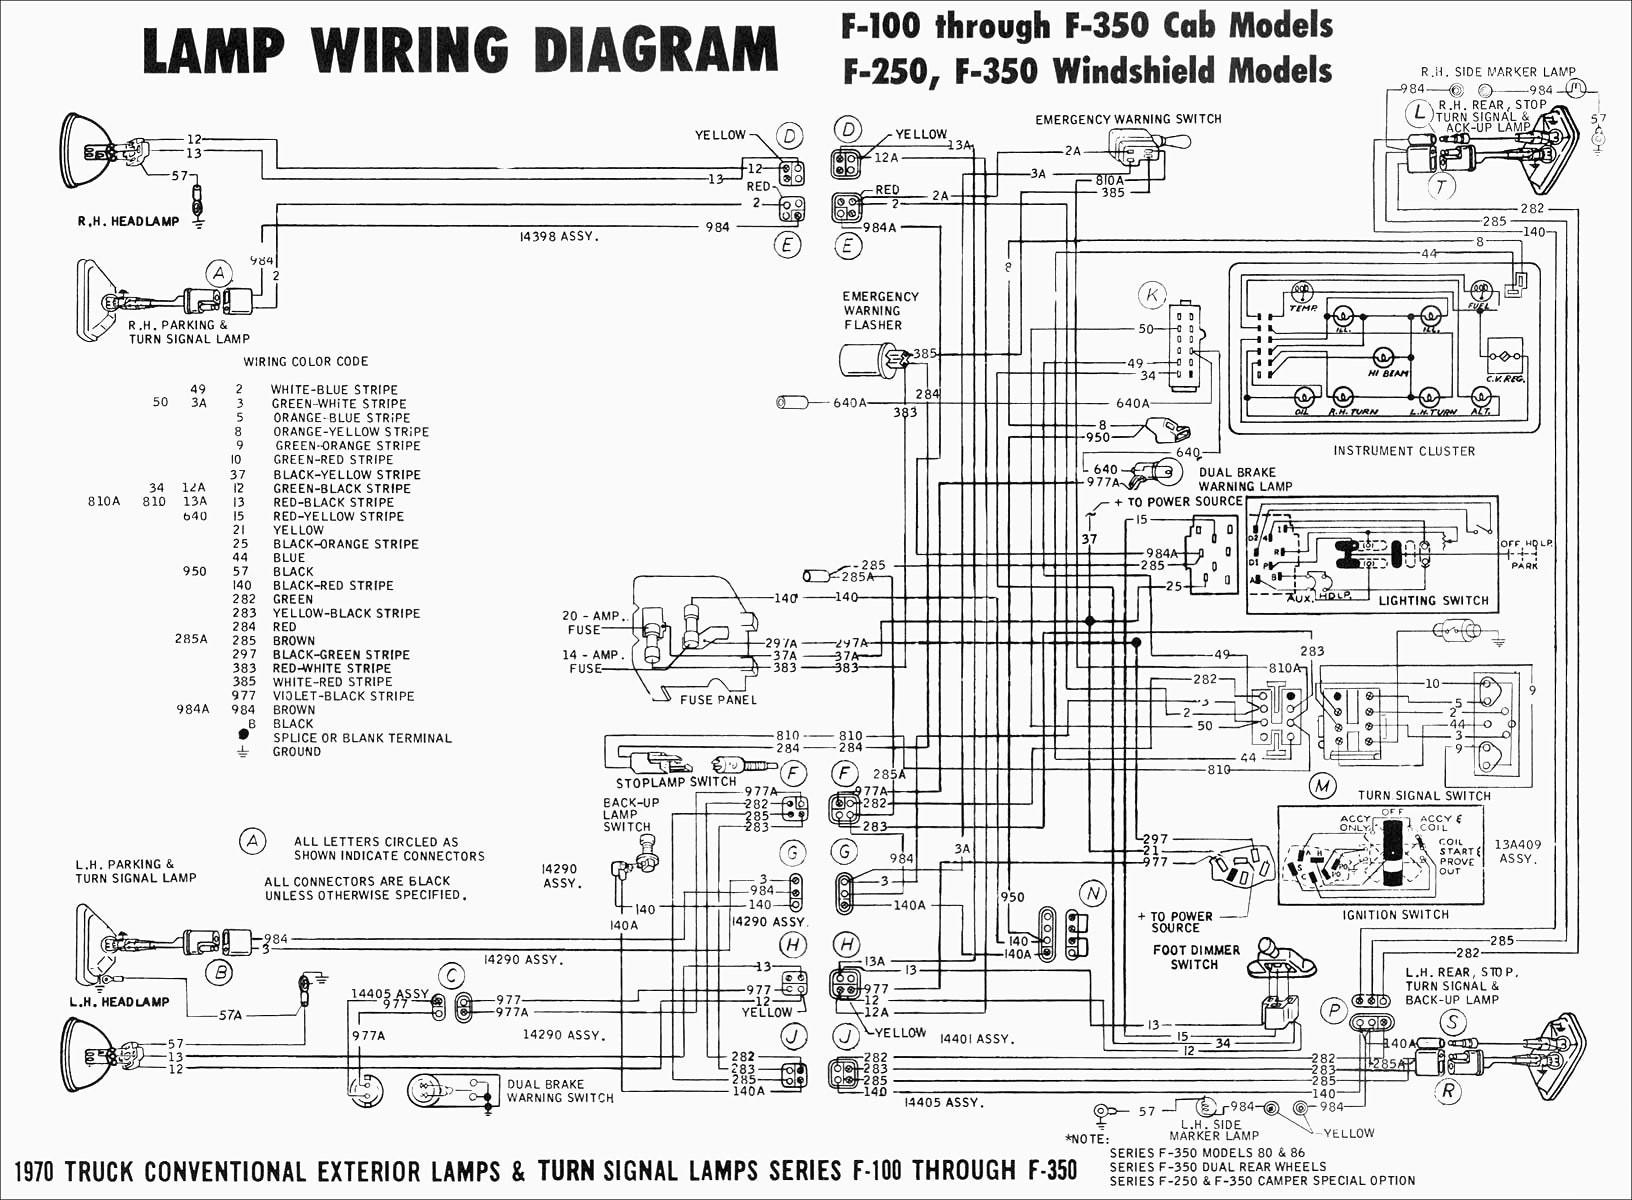 2000 Jeep Grand Cherokee Laredo Engine Diagram Jeep Grand Cherokee Wiring Diagram  2000 Chevy Silverado Wiring